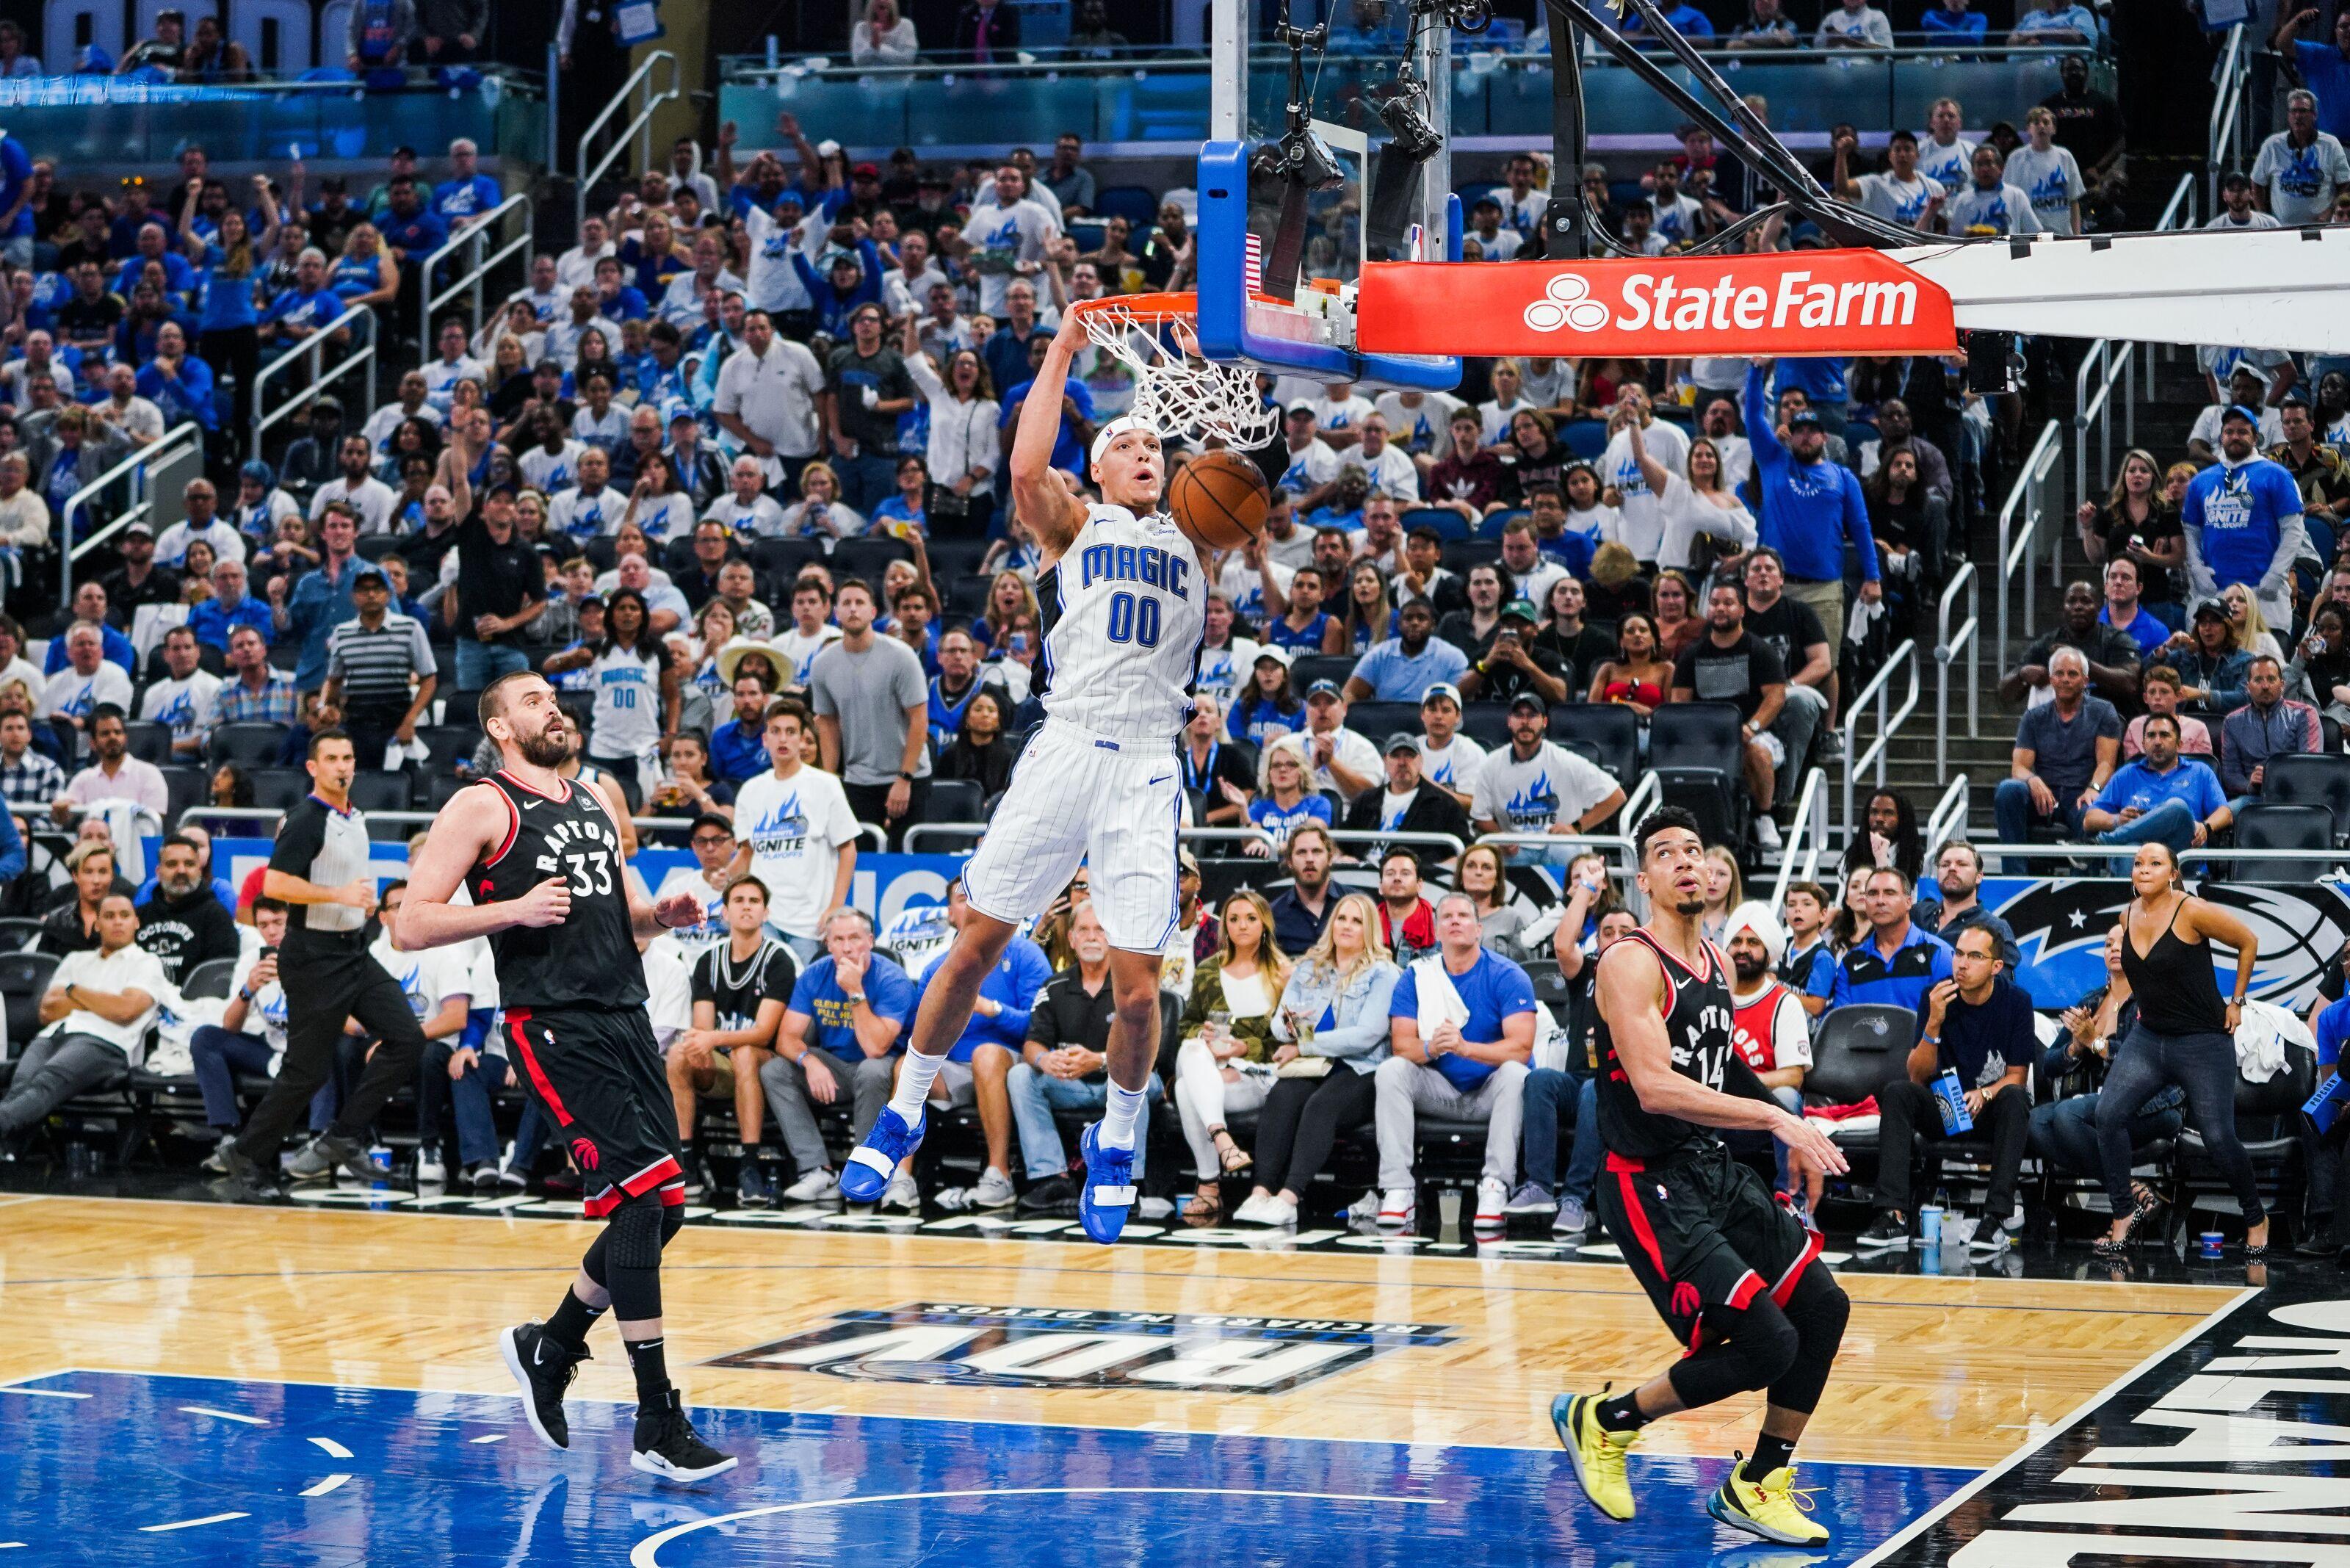 Orlando Magic: Top 10 moments of the 2018-19 NBA season